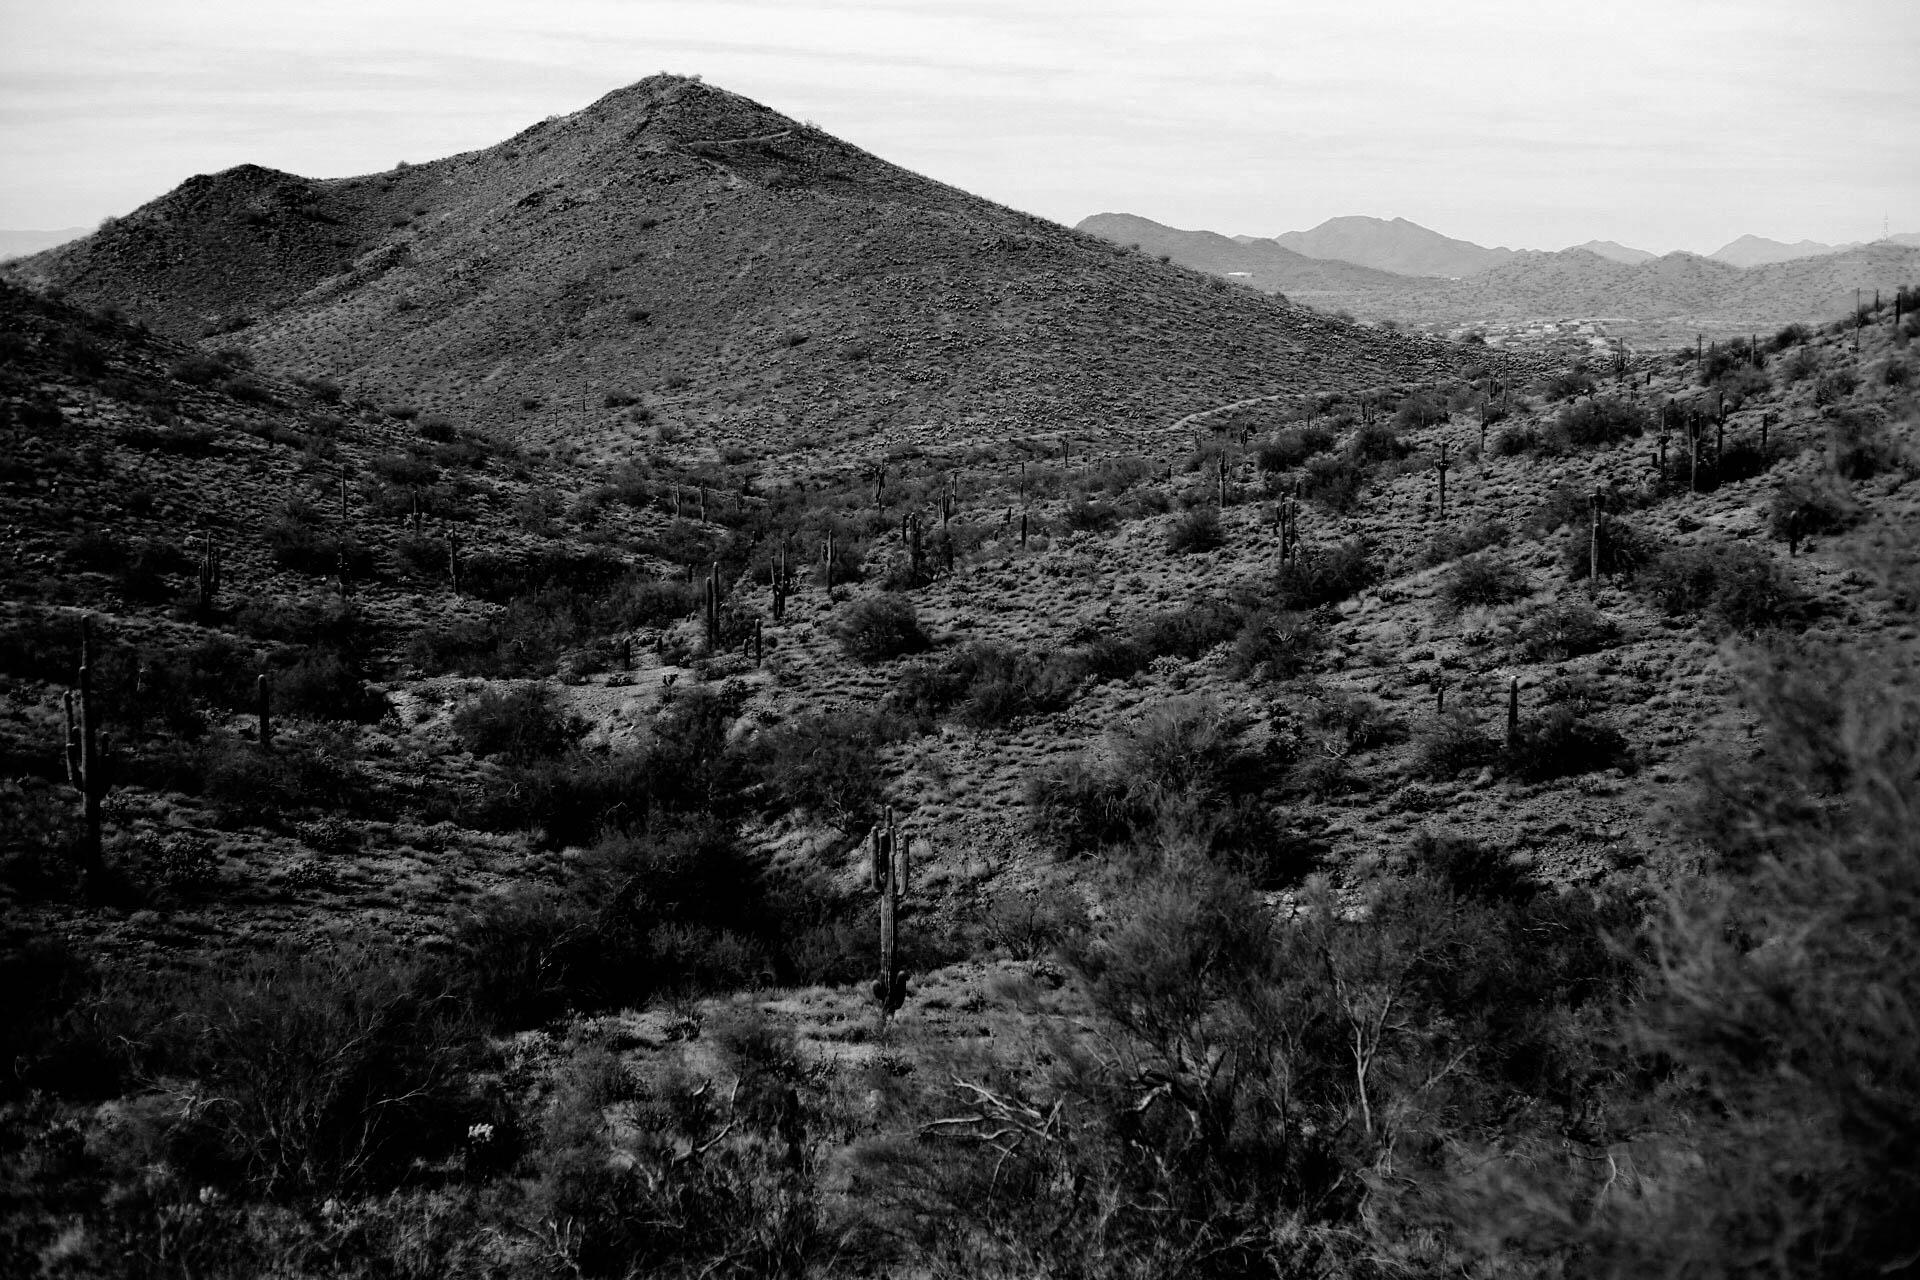 February 2018, Sonoran Desert Hike